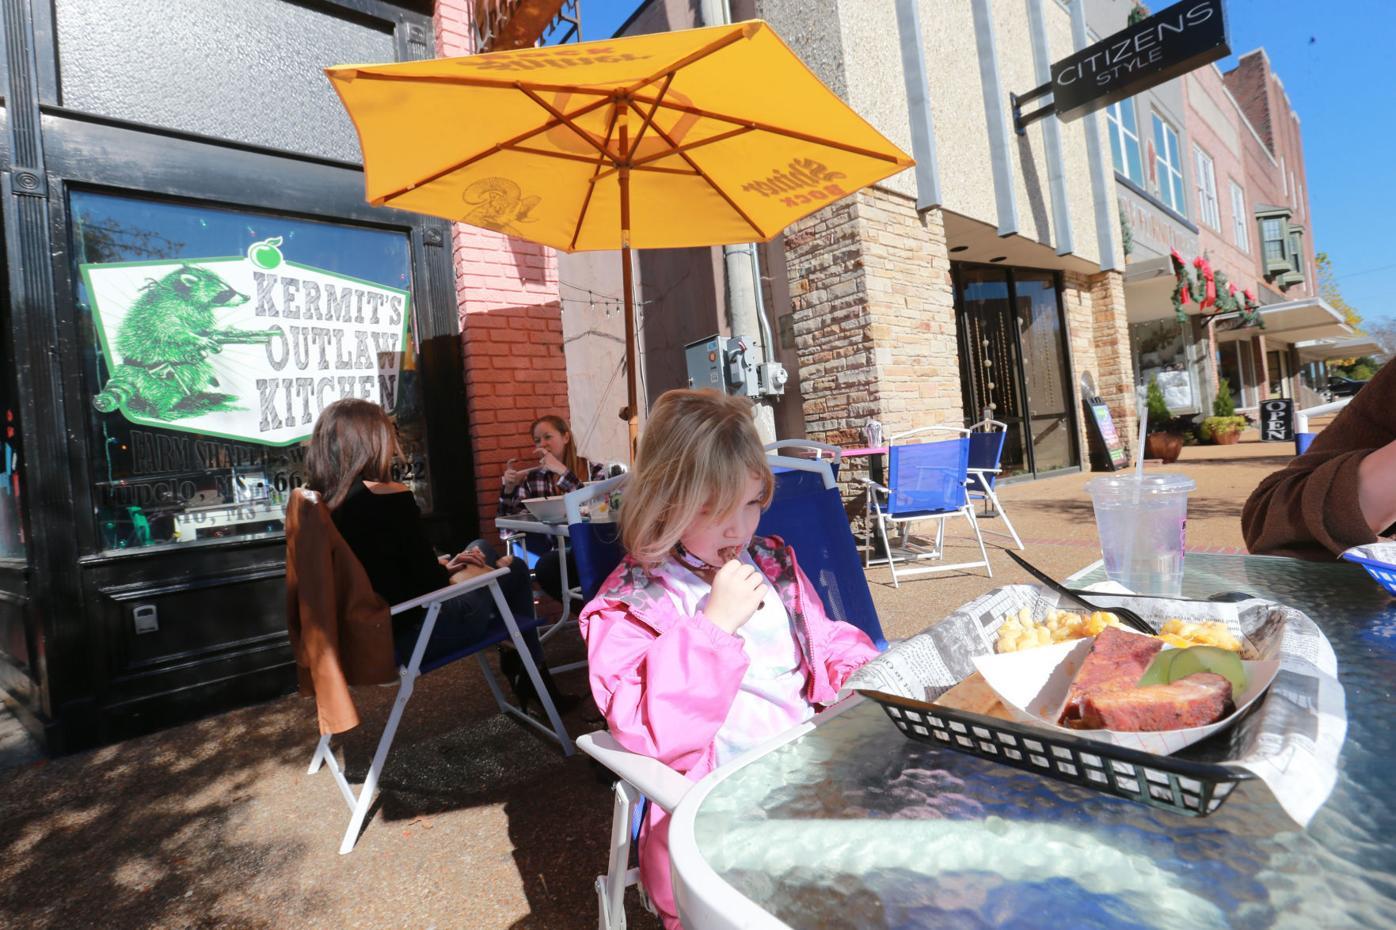 djr-2020-11-22-news-outdoor-dining-twp3